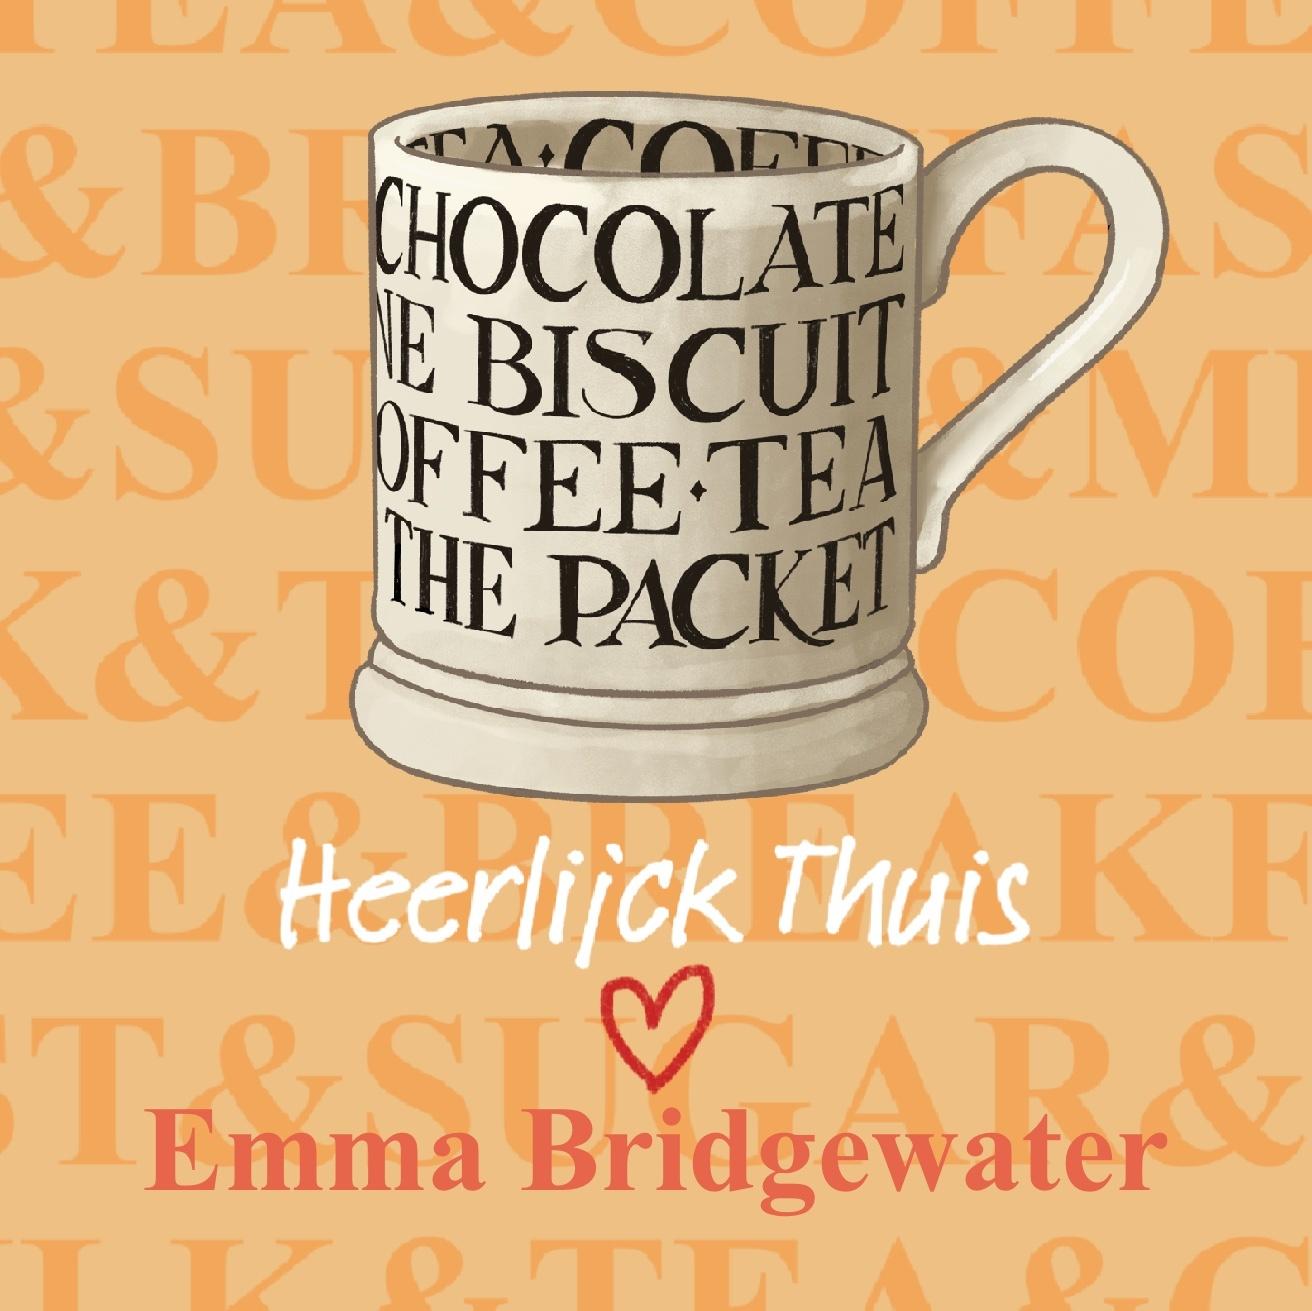 Heerlijck Thuis ❤️ Emma Bridgewater